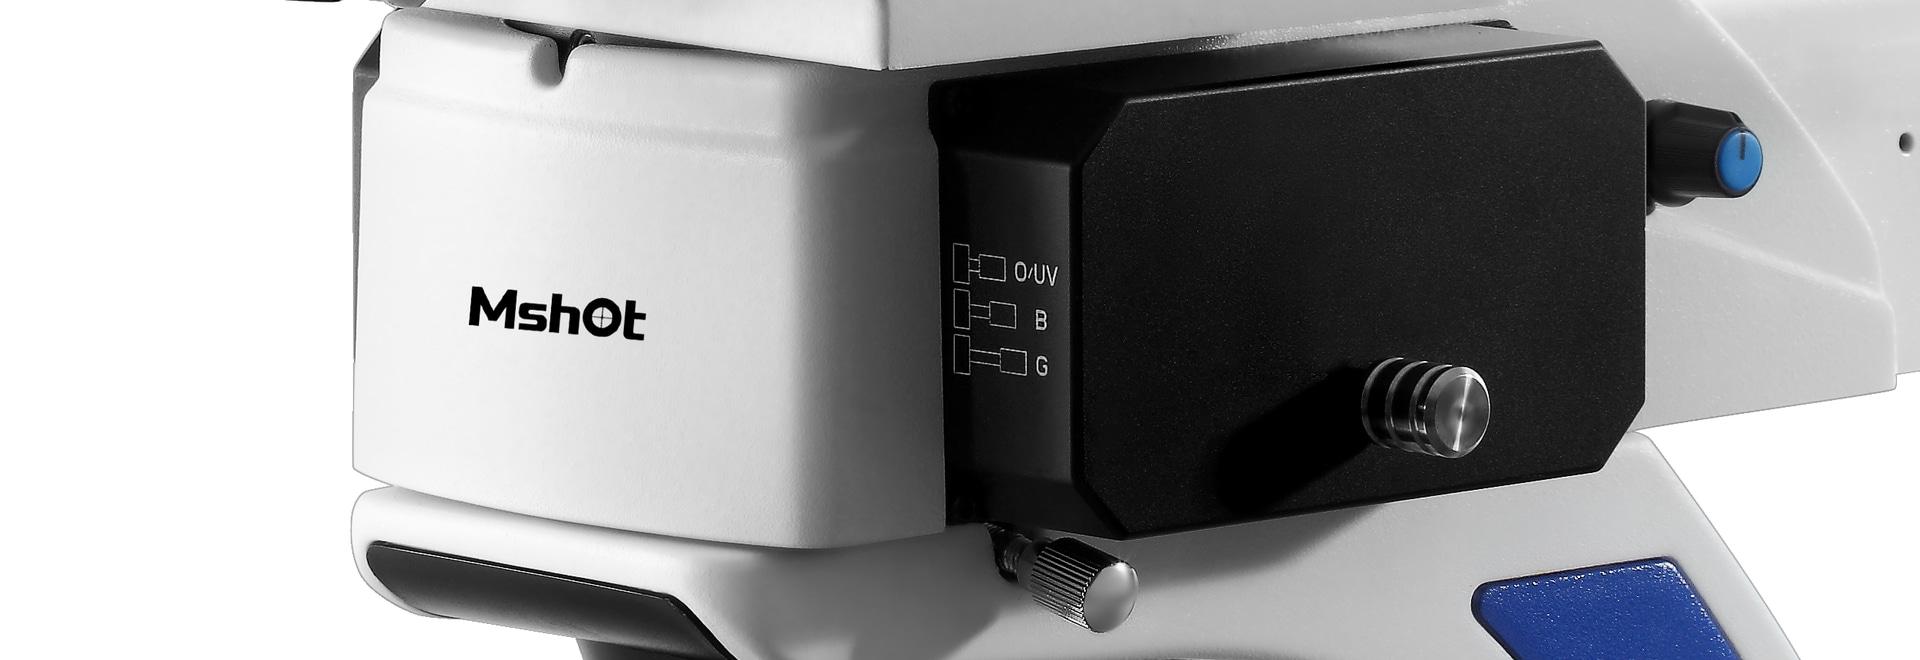 Microscope à fluorescence Mshot